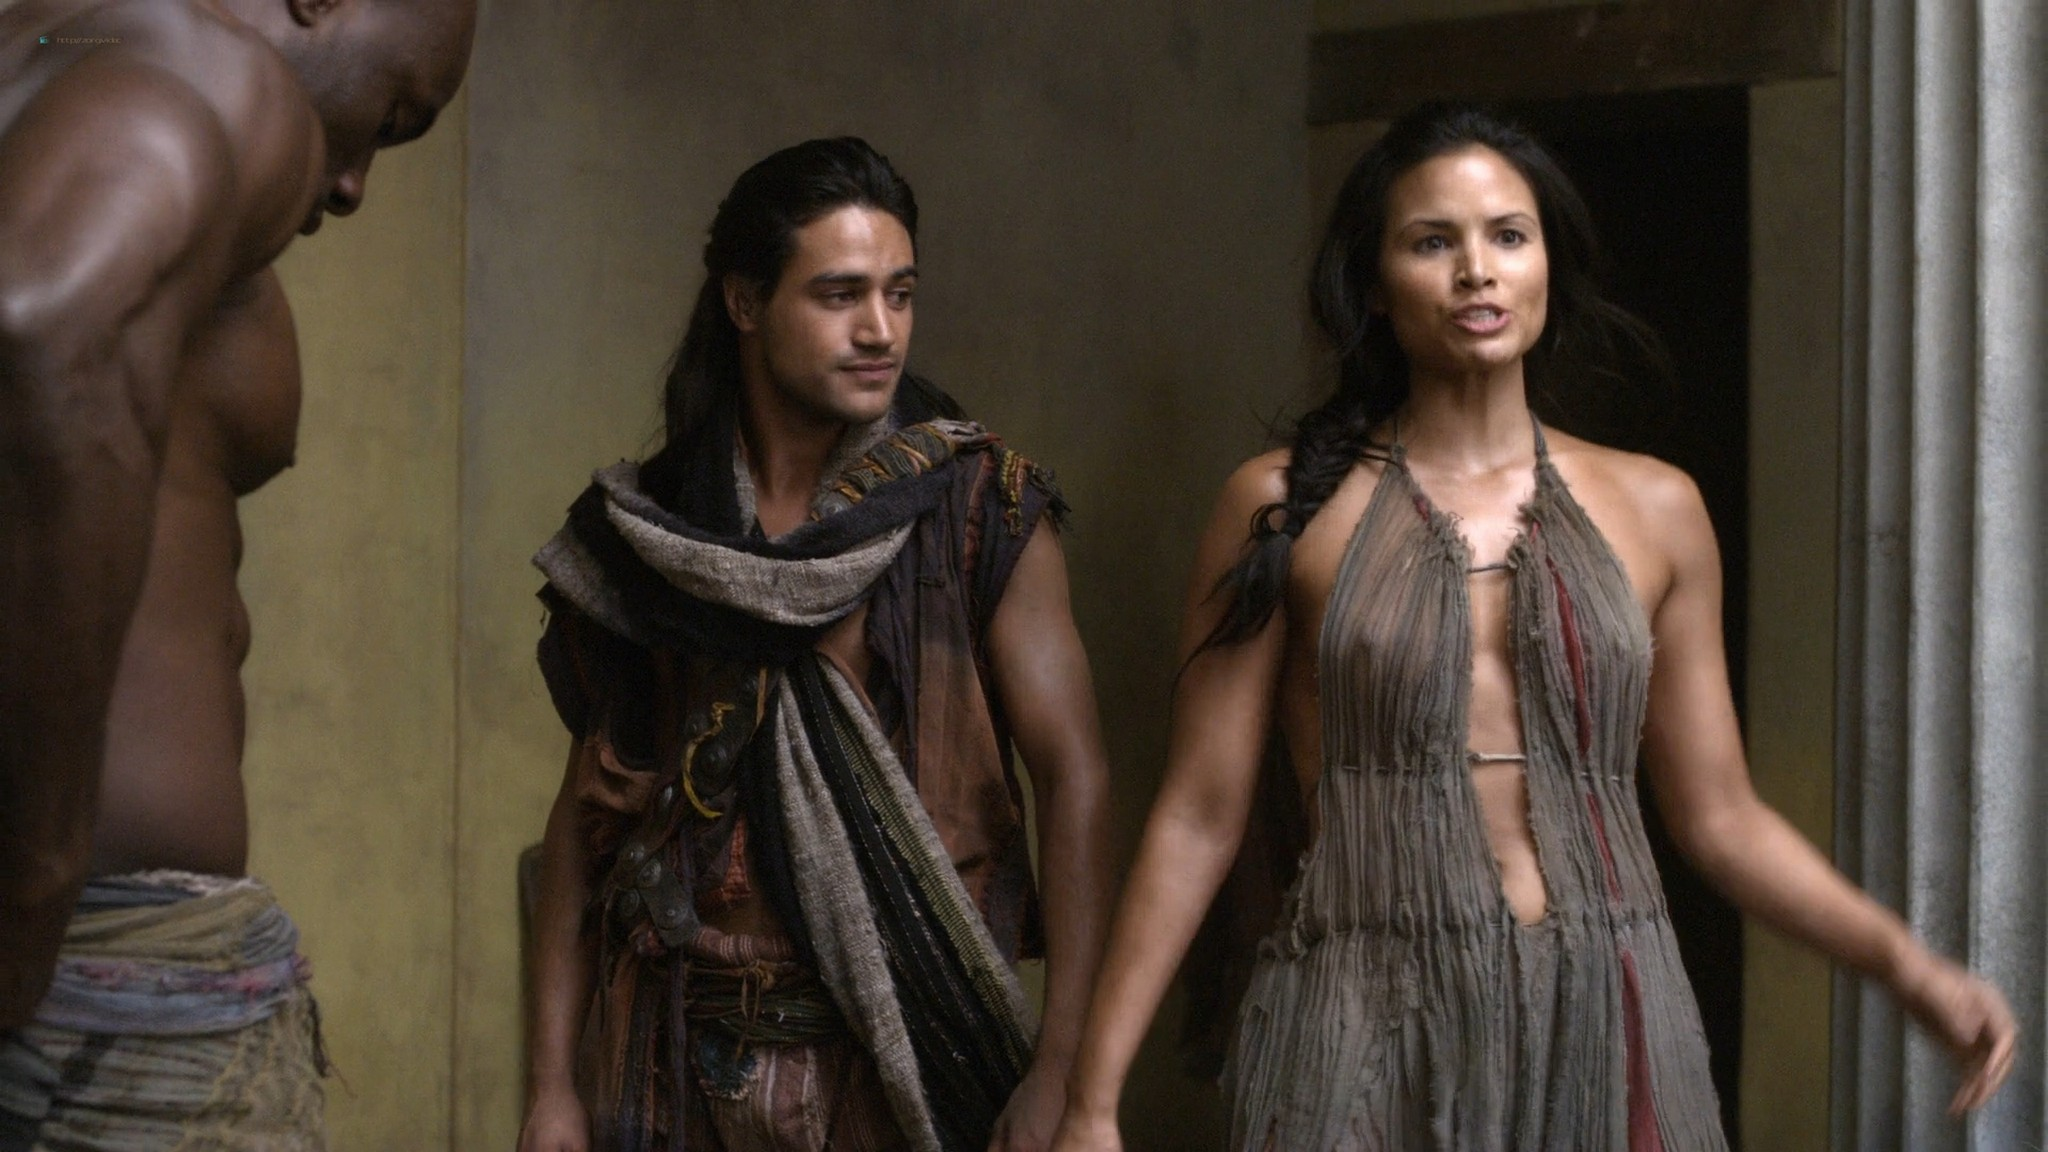 Viva Bianca nude topless Katrina Law, Bonnie Sveen, etc -Spartacus - Vengeance (2012) e3 1080p (6)